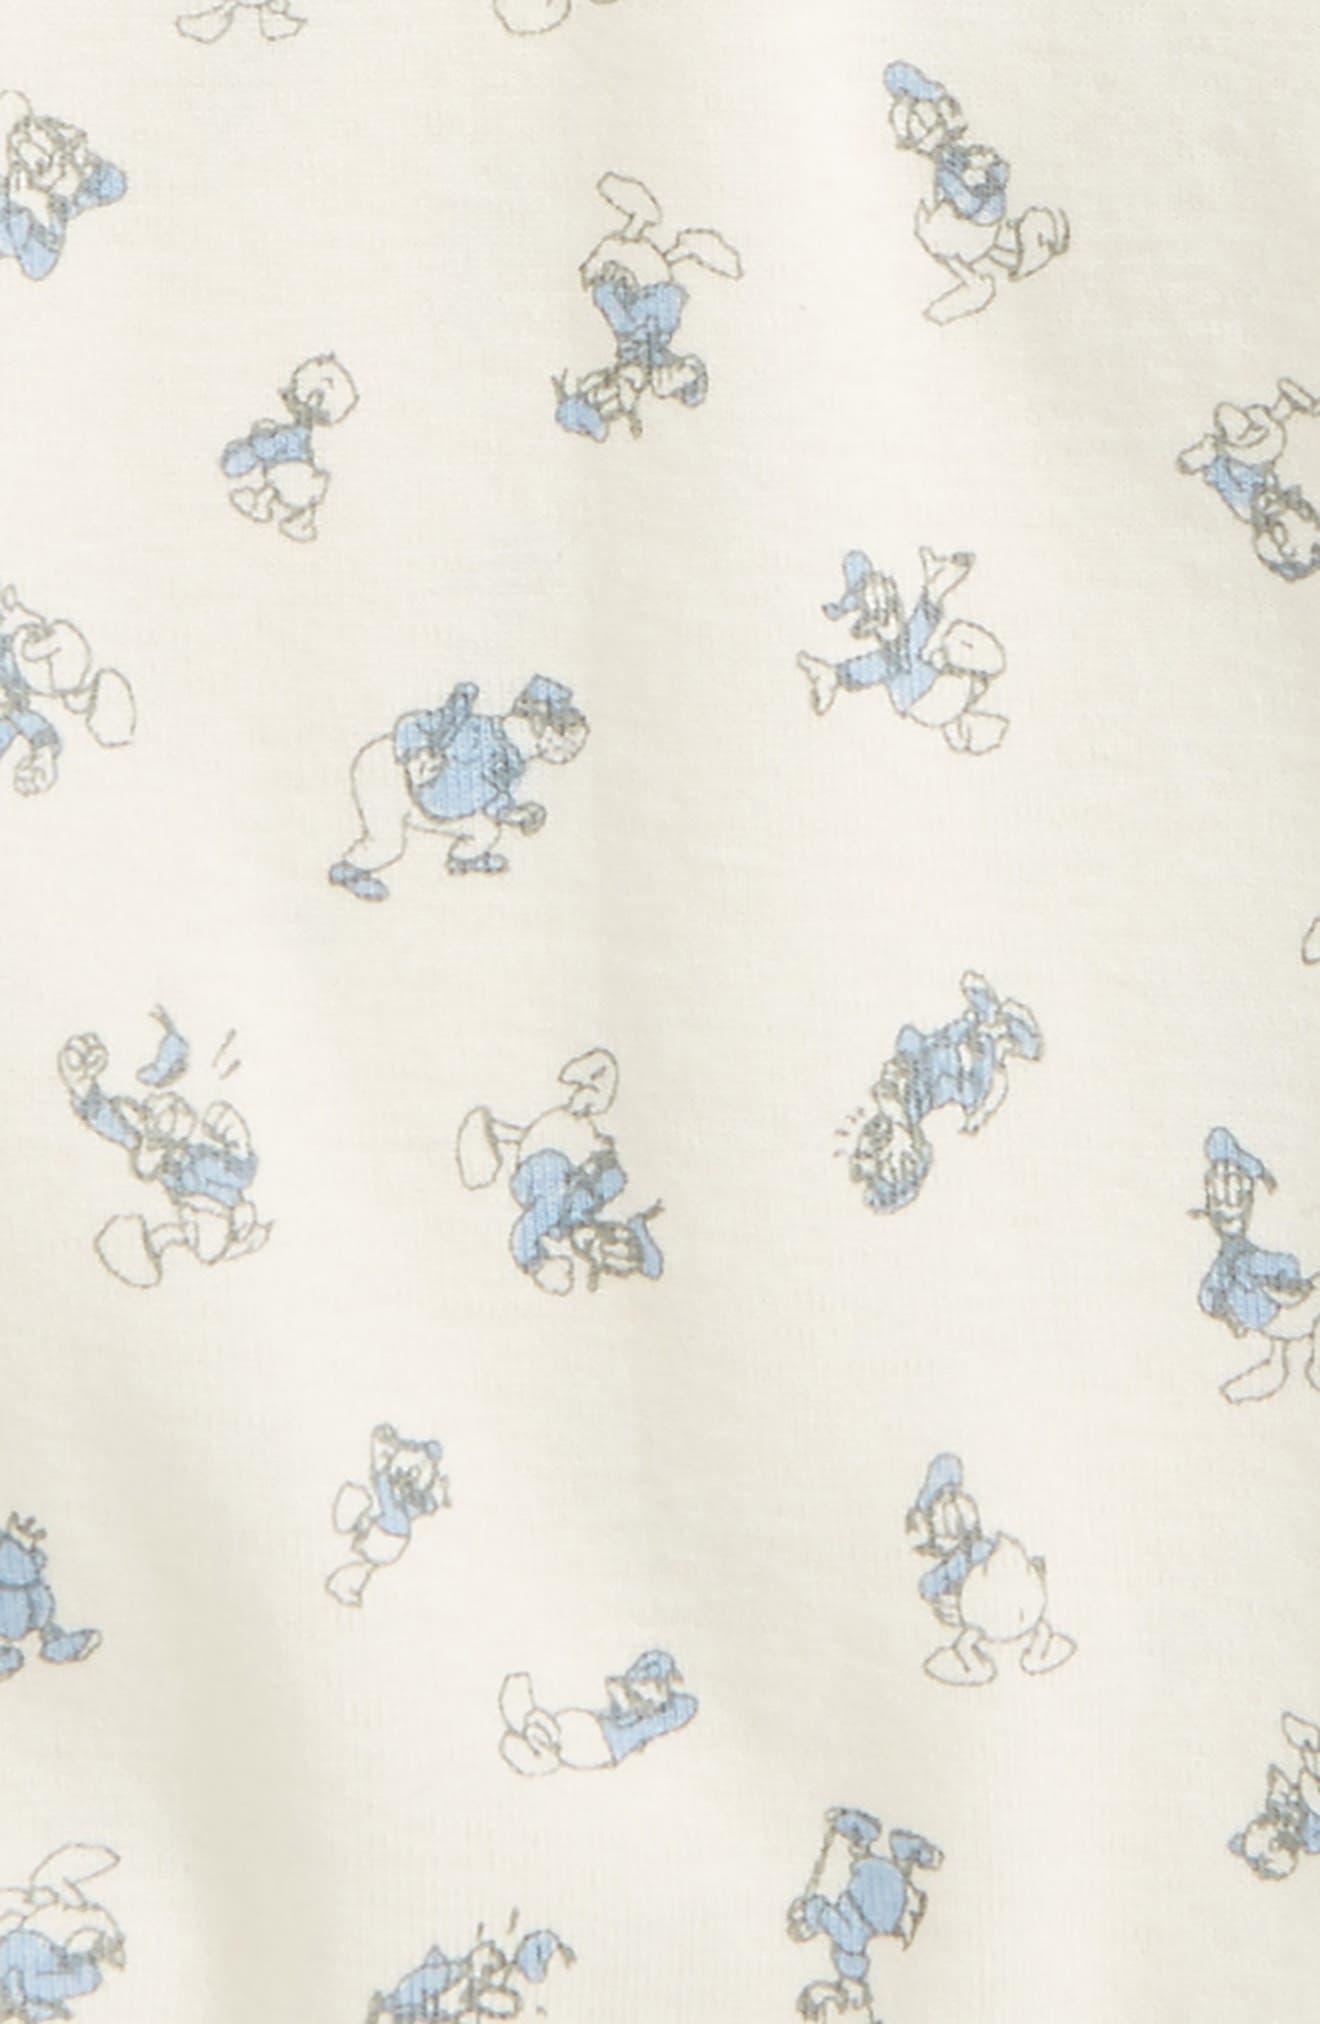 x Disney<sup>®</sup> Duckerberg Organic Cotton Bodysuit,                             Alternate thumbnail 2, color,                             902